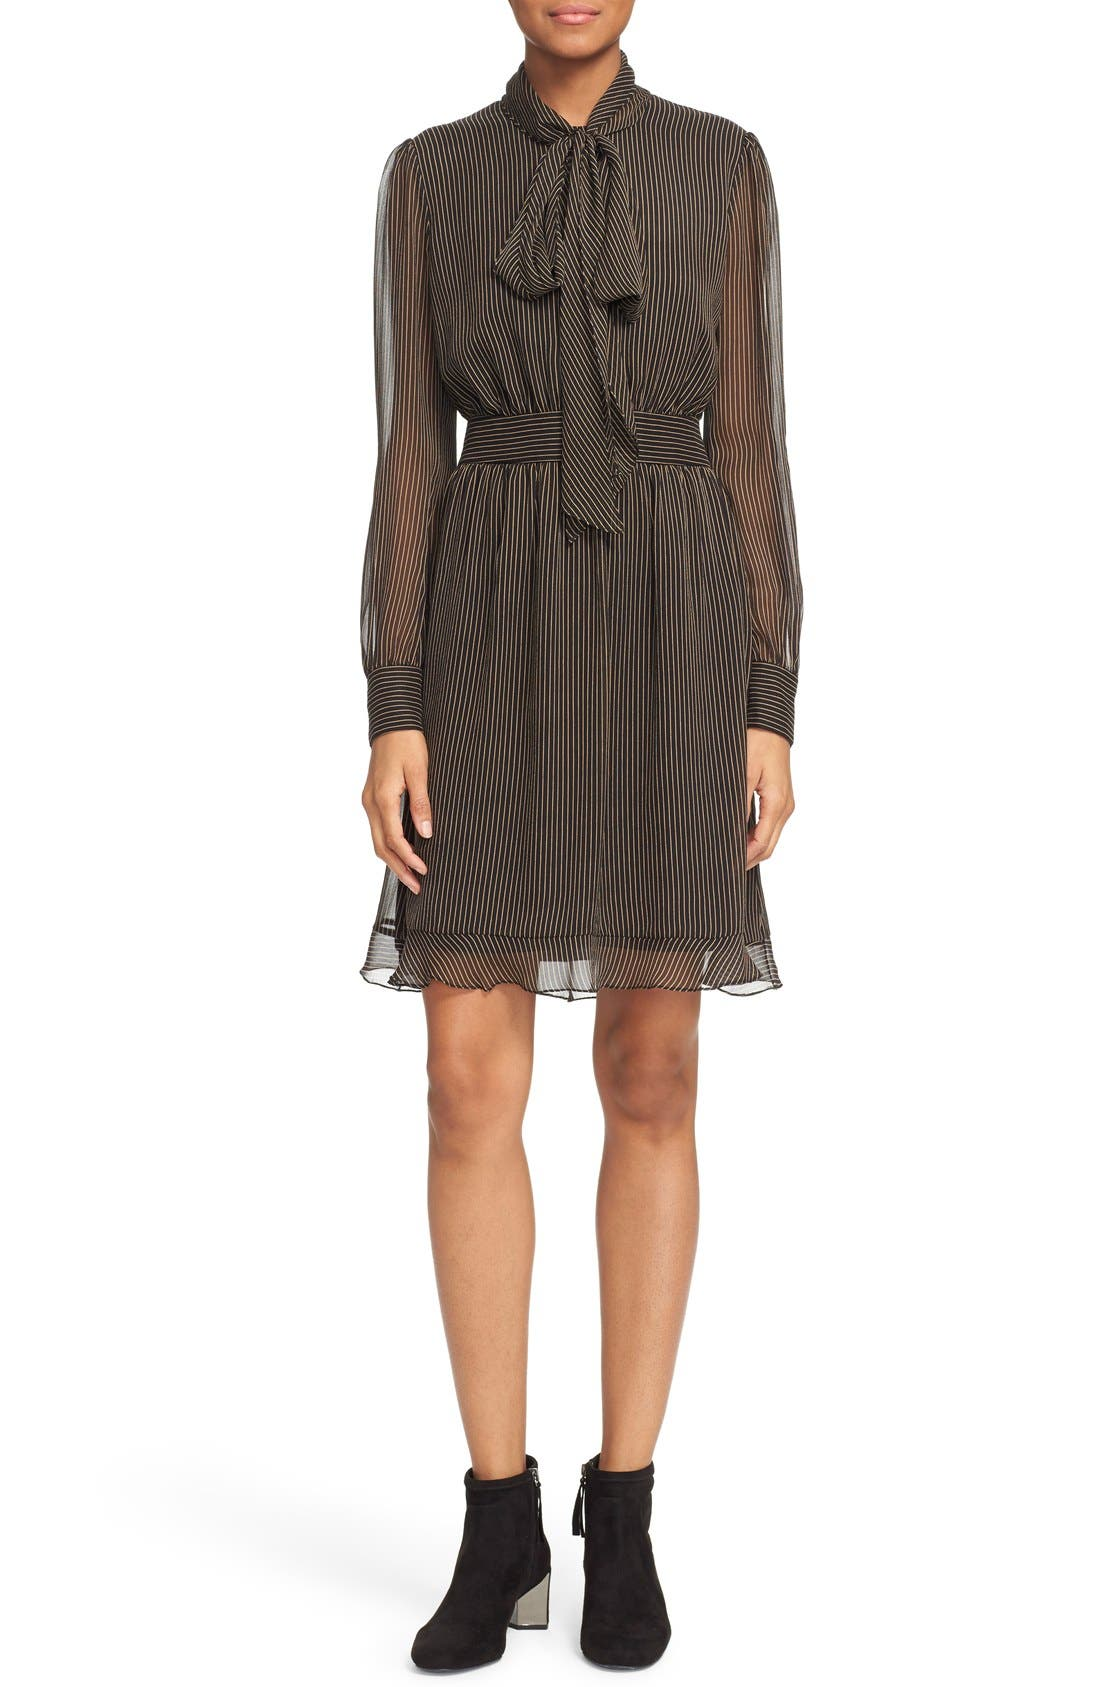 Alternate Image 1 Selected - Diane von Furstenberg 'Arabella' Pinstripe Silk Dress